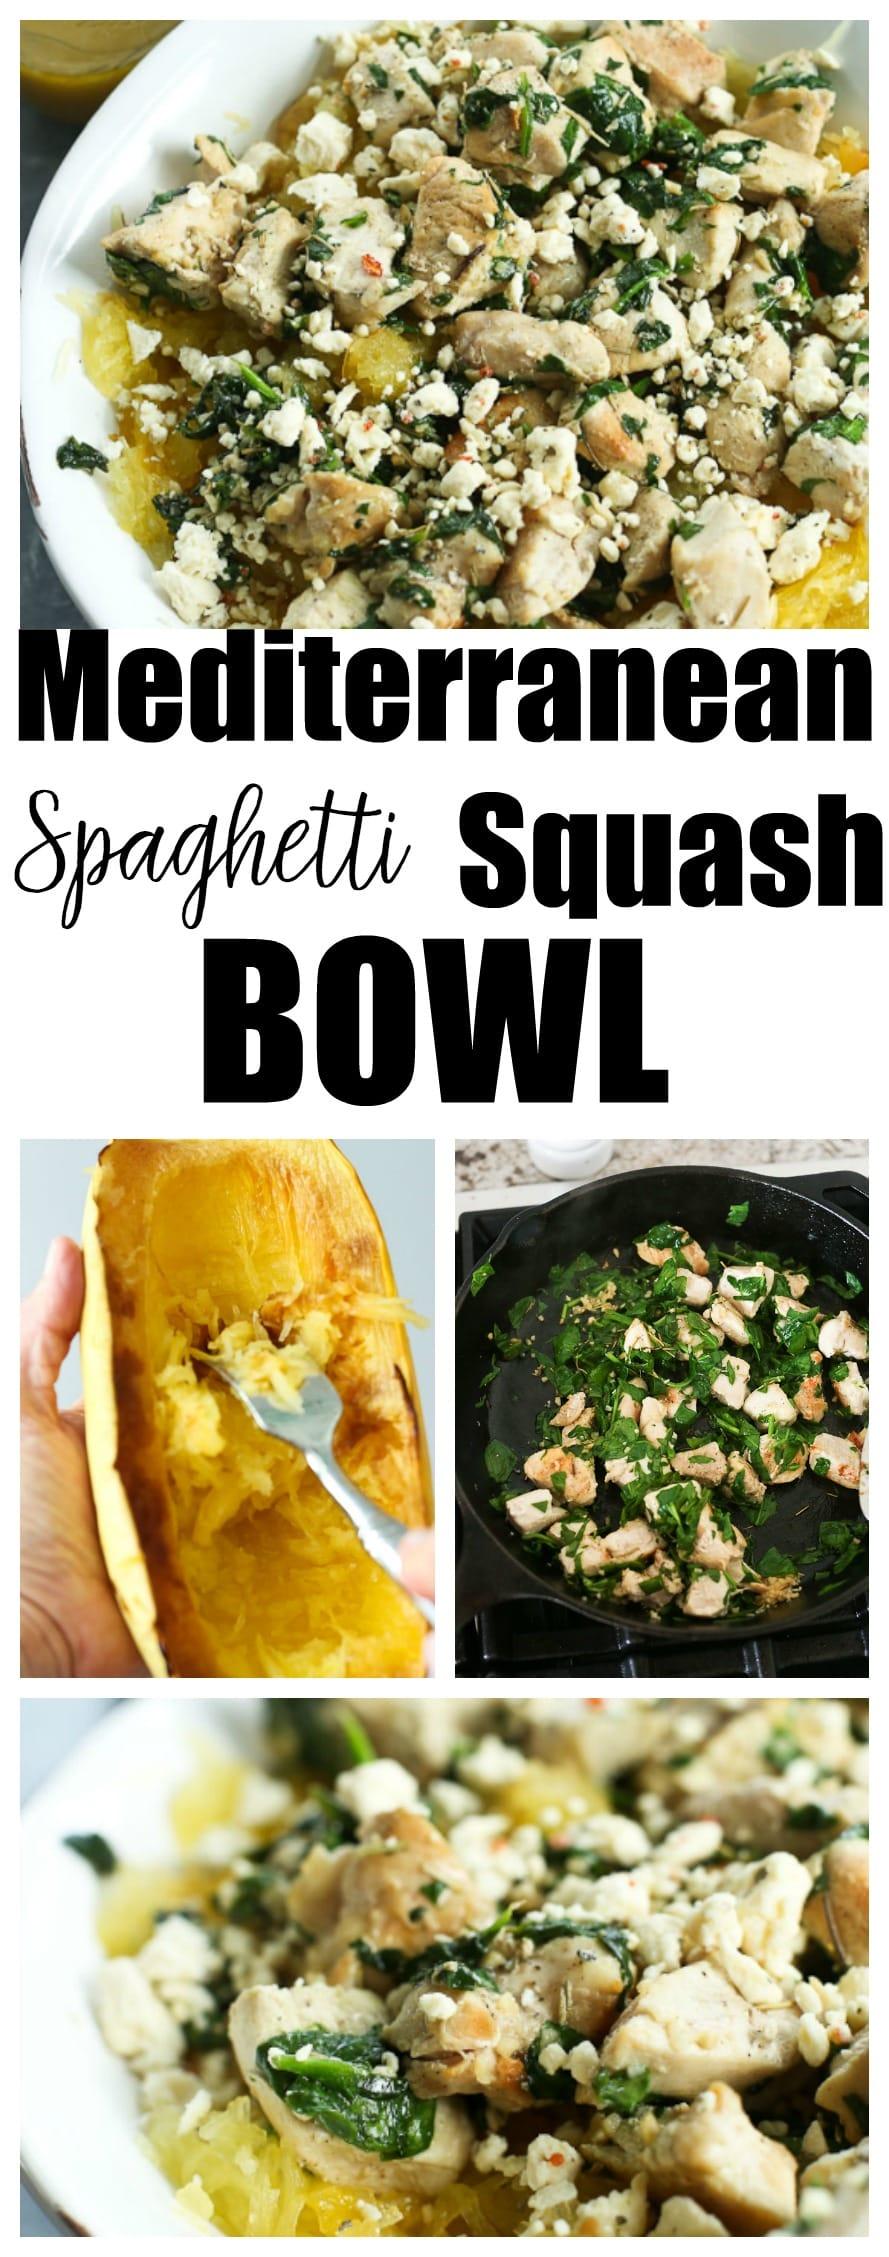 Mediterranean Spaghetti Squash Bowl Recipe. Healthy weeknight dinner idea! #glutenfree #healthyrecipes